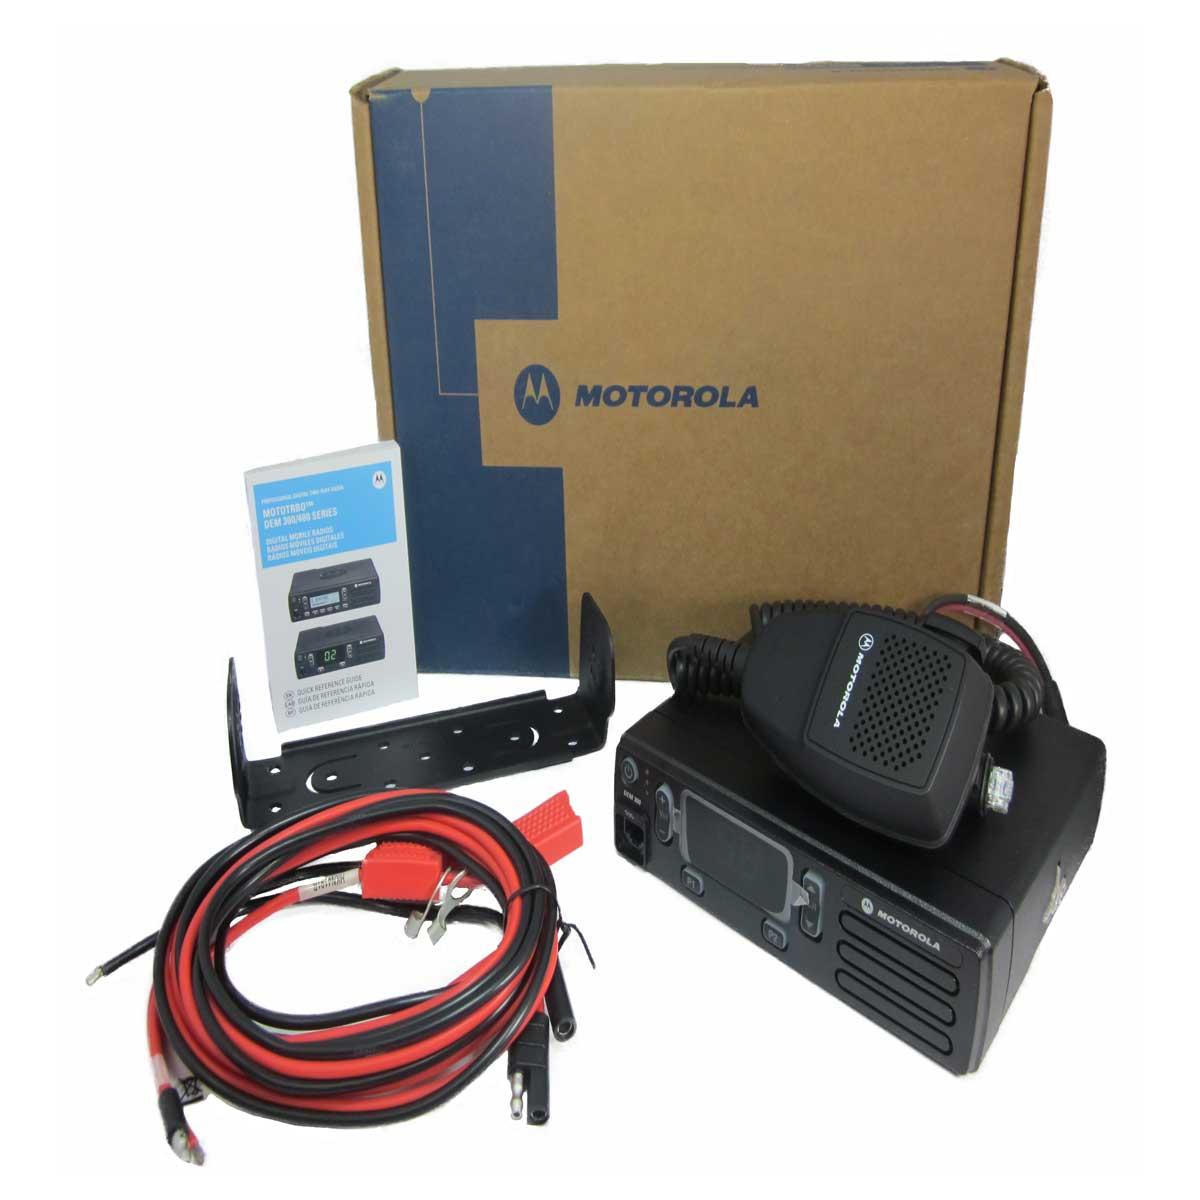 Radio Motorola DEM300 Digital LAM01JNC9JA1AN VHF 136-174 MHZ de 25W